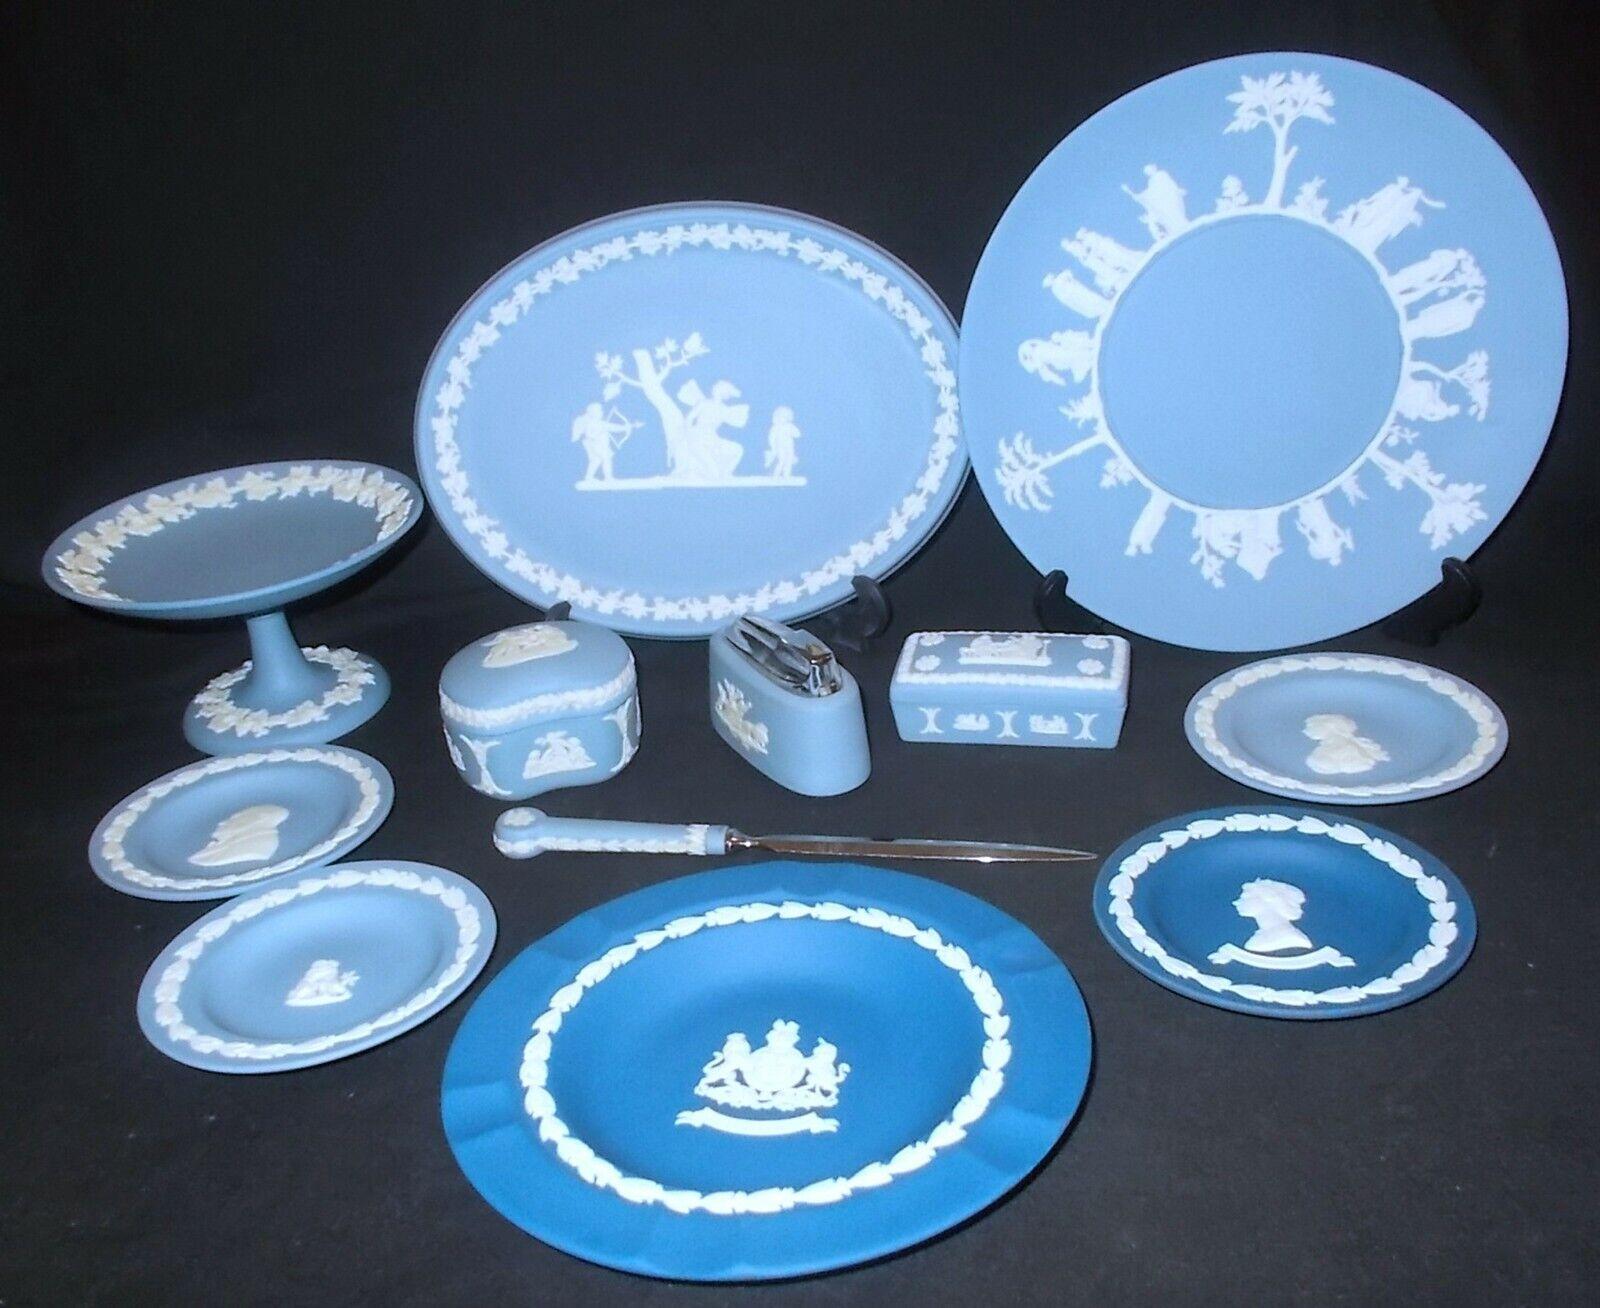 Image 1 - Wedgwood BLUE JASPER WARE 12 Assorted Pieces - Job Lot Incl. Lighter & Plaque